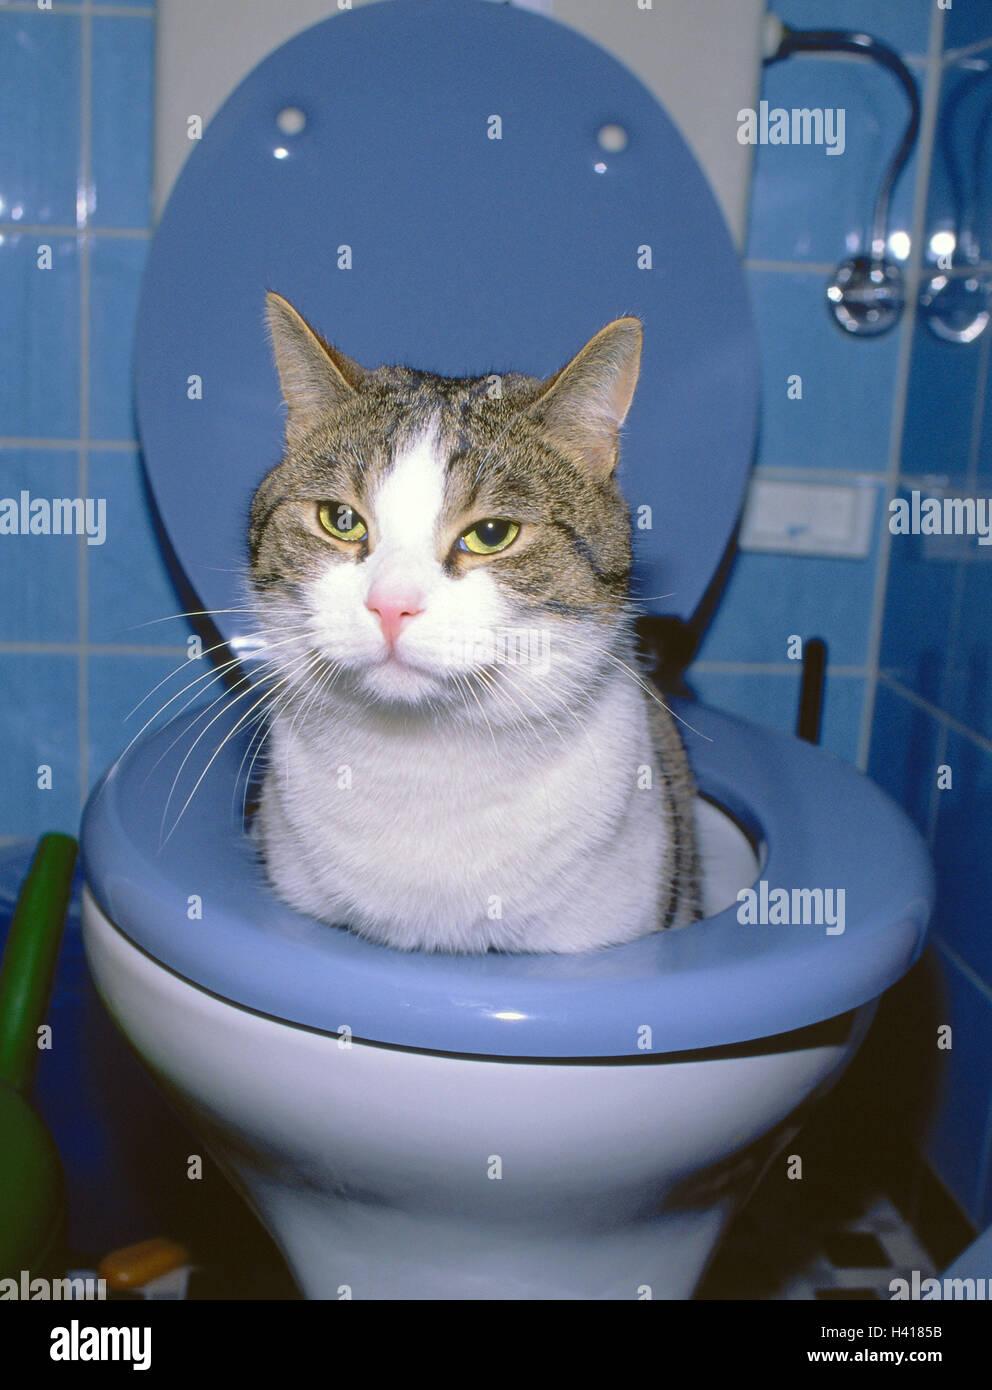 Cat peeing in bathtub